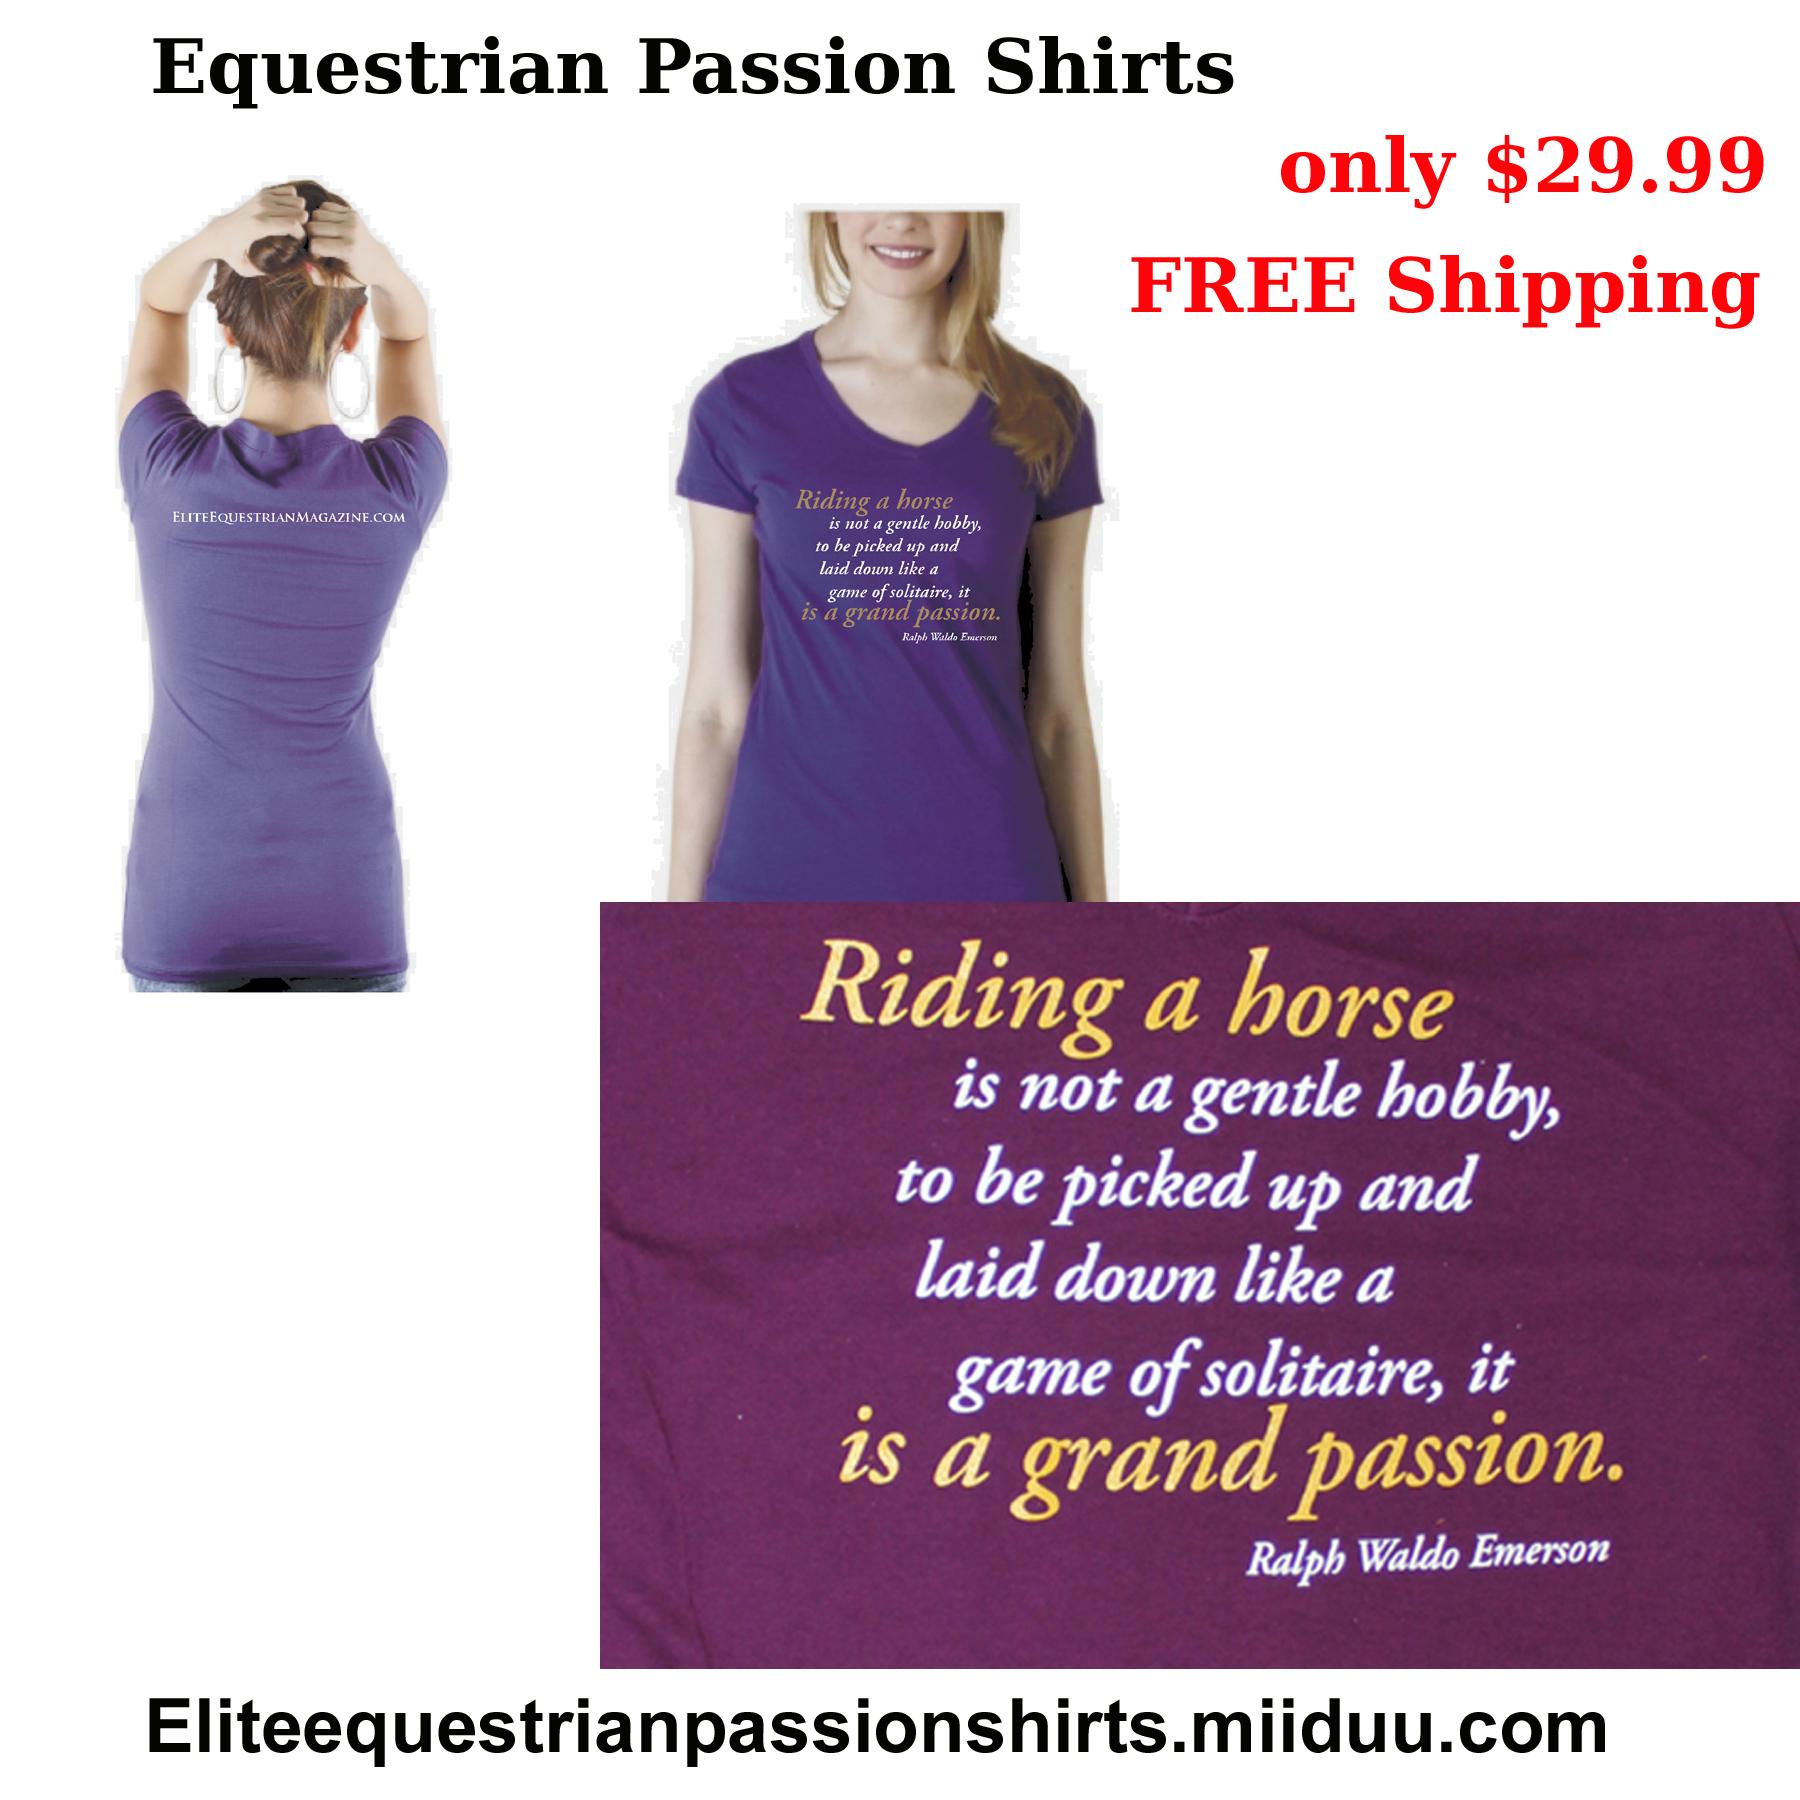 Elite Equestrian  Passion Shirts